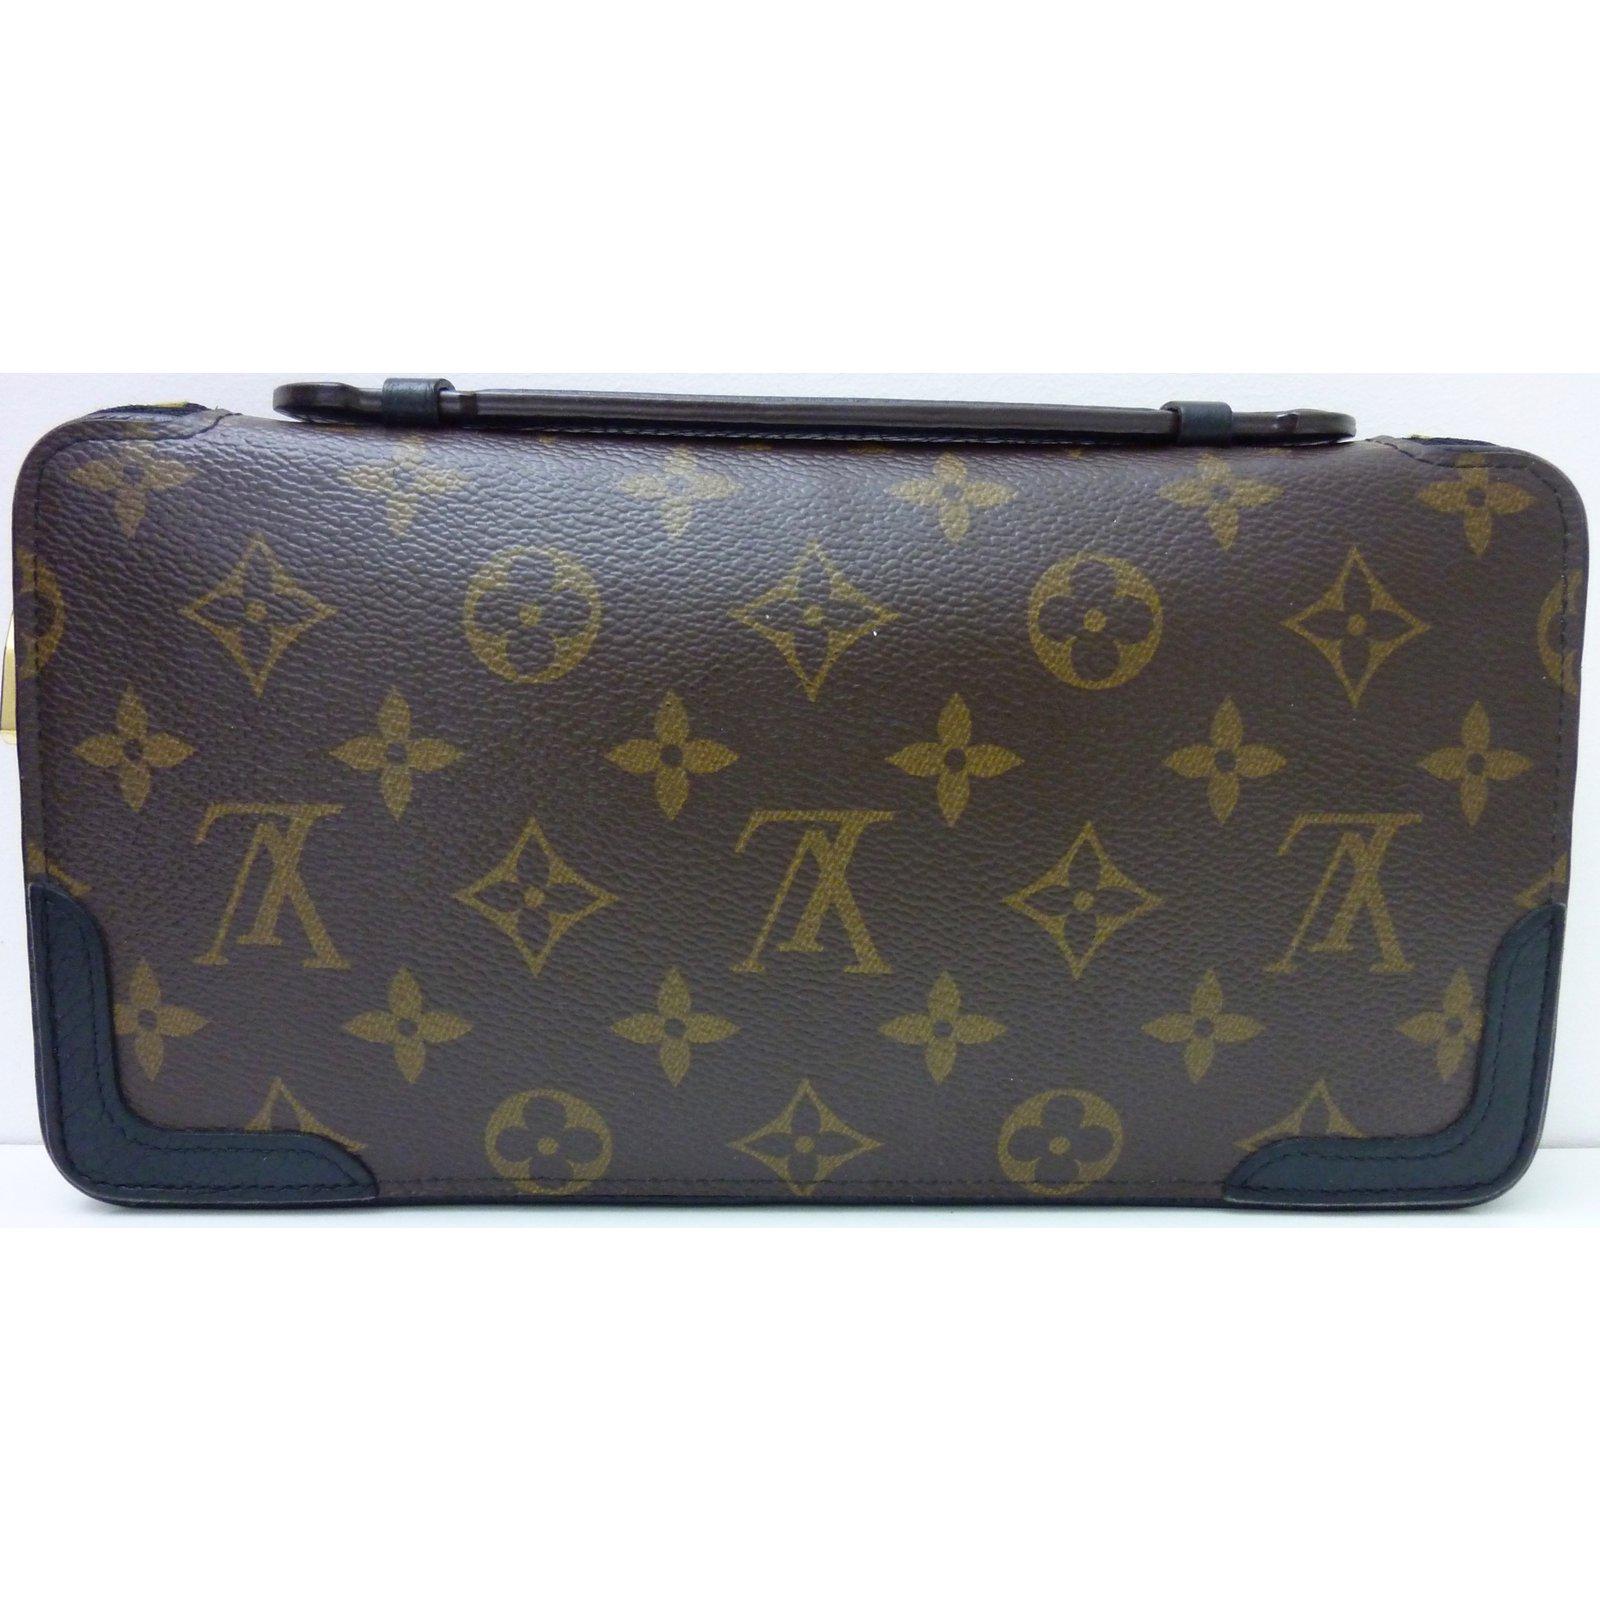 f1f0a8b7f220 ... louis vuitton daily organizer wallets leather cloth brown black ref ...